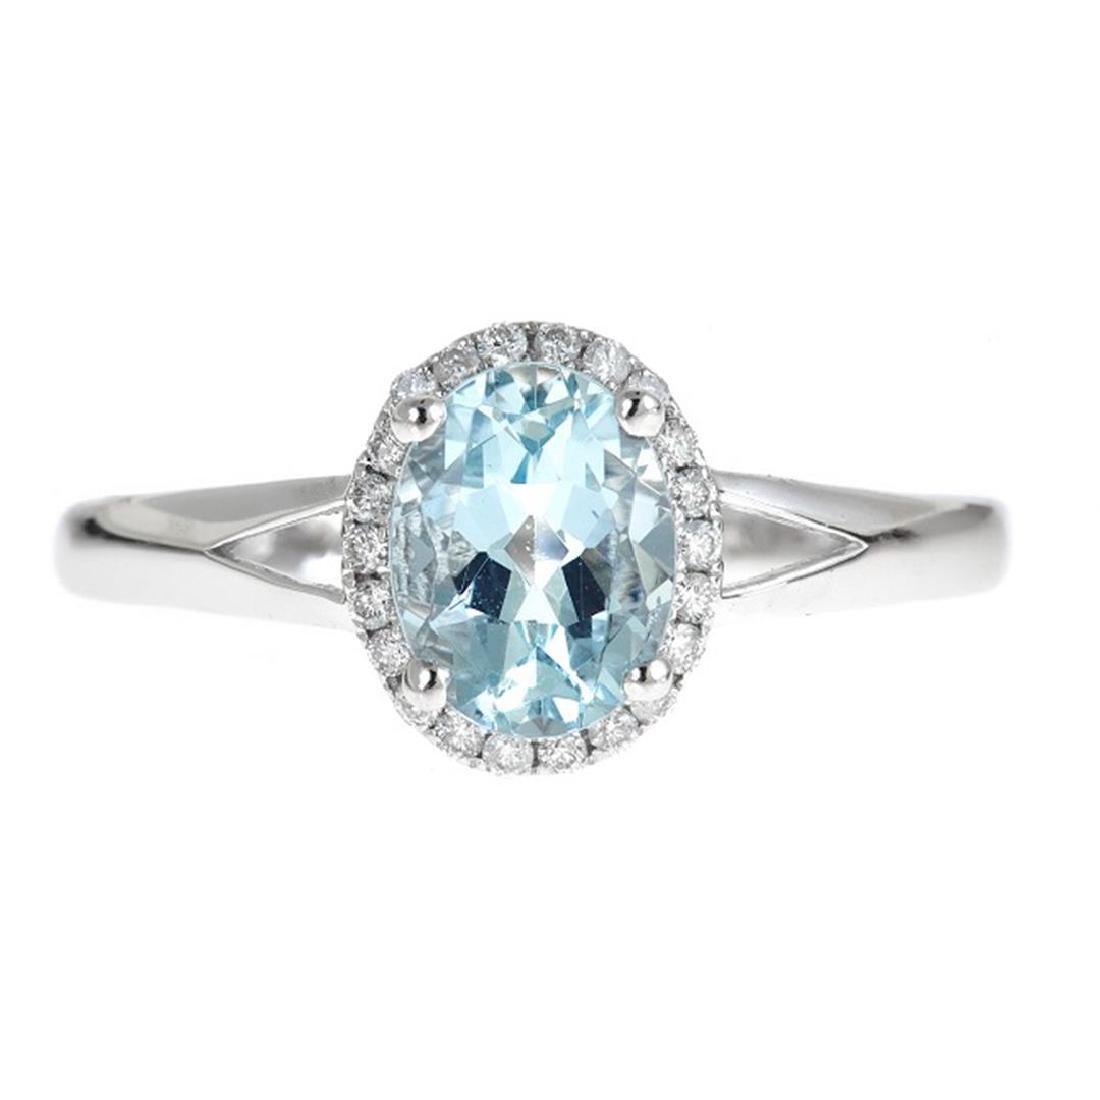 1.21 ctw Aquamarine and Diamond Ring - 14KT White Gold